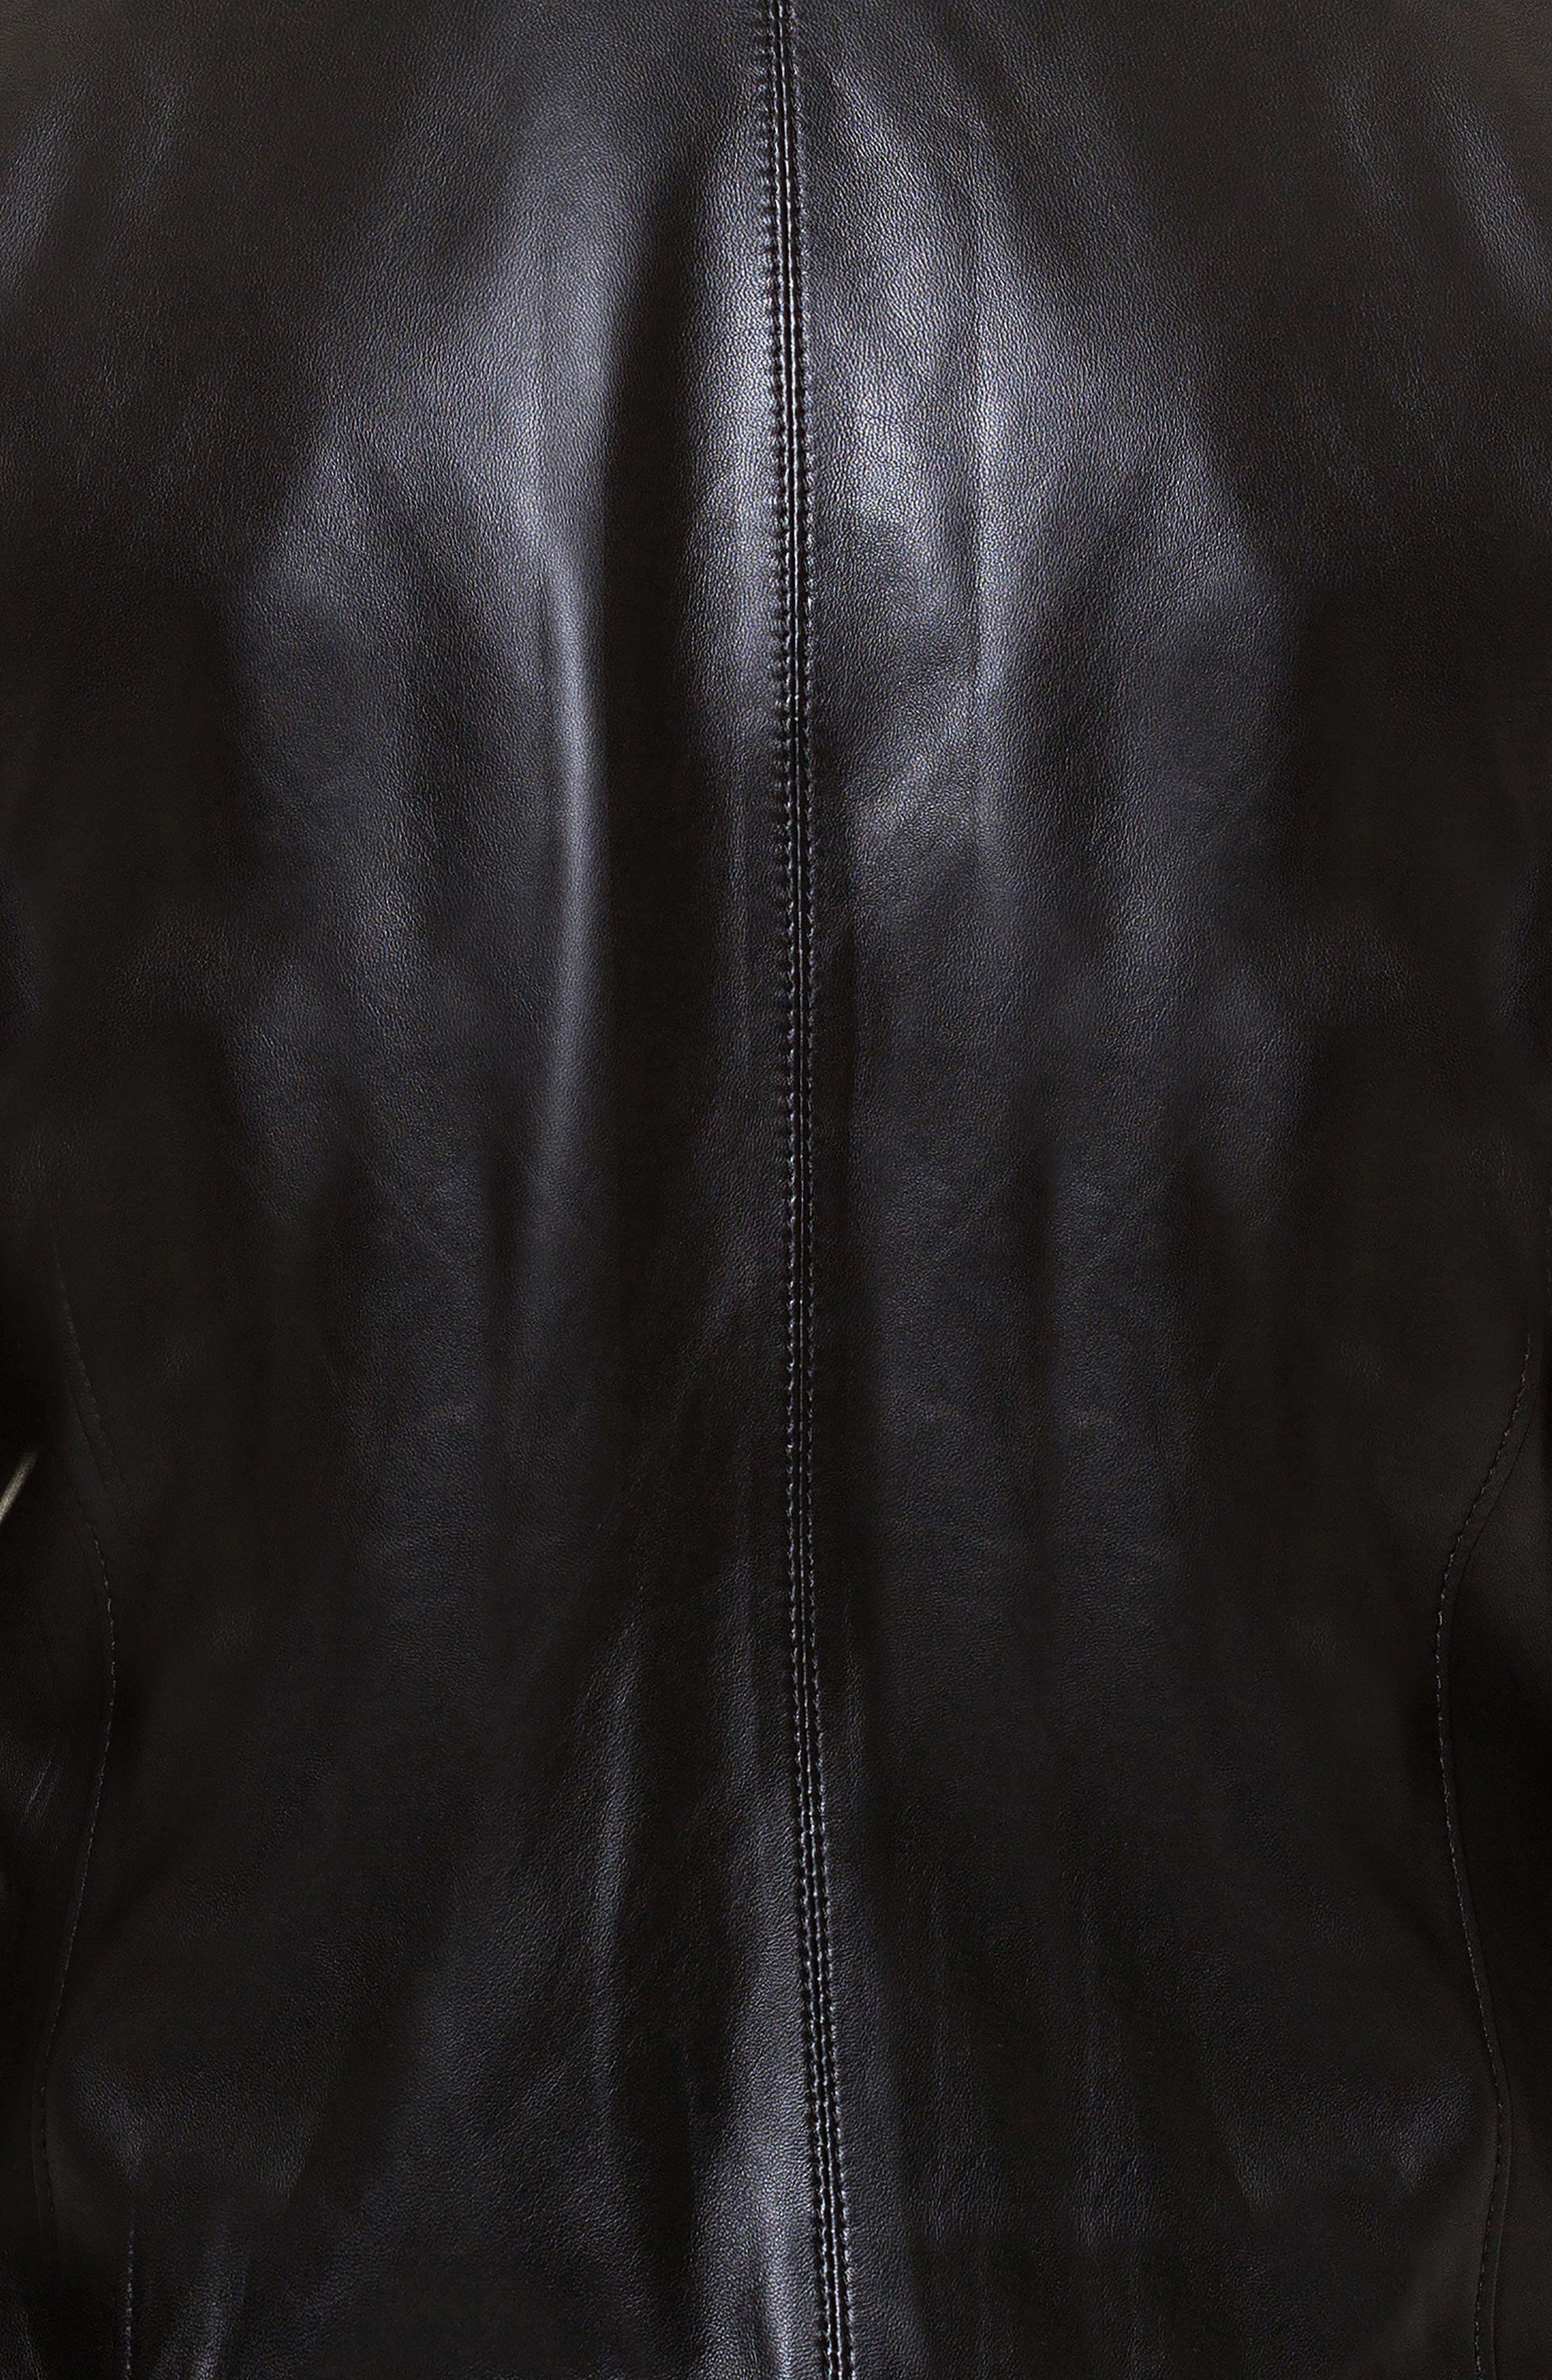 Tron Print Leather Jacket,                             Alternate thumbnail 4, color,                             Black